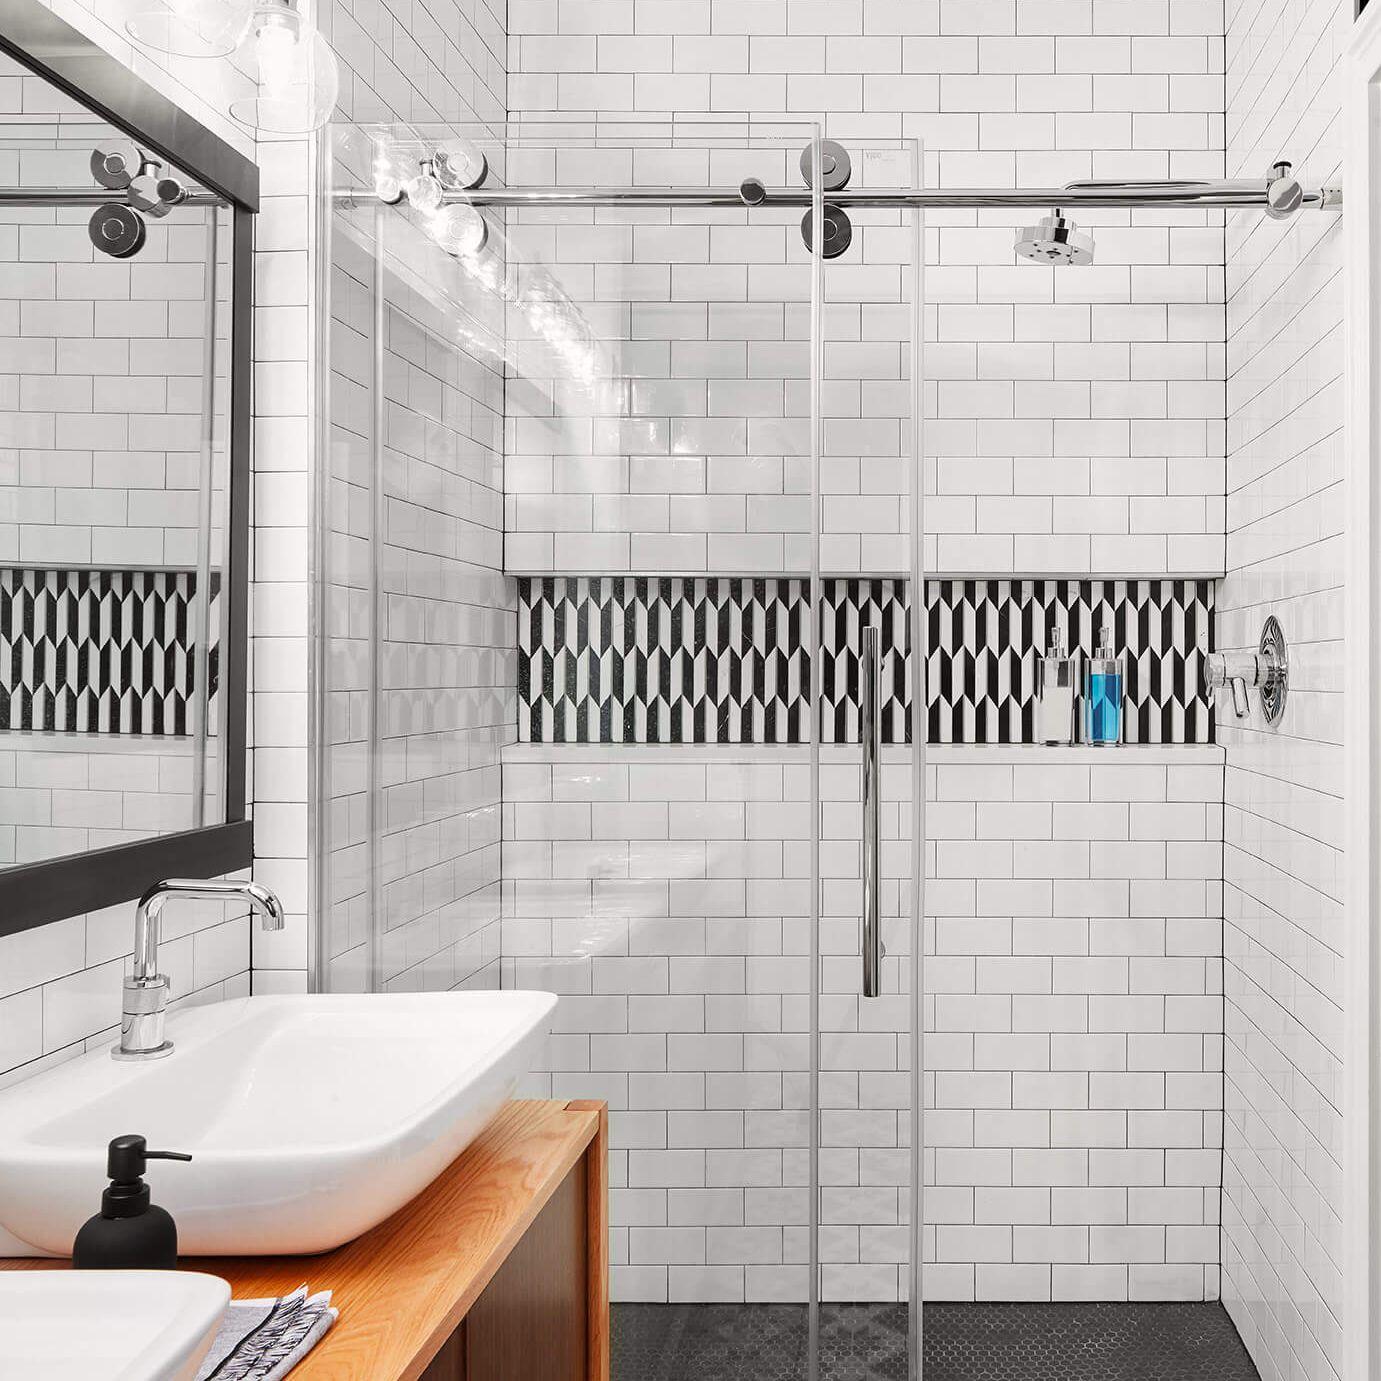 16 Subway Tile Bathroom Ideas To Inspire Your Next Remodel,Indian Non Modular Kitchen Designs